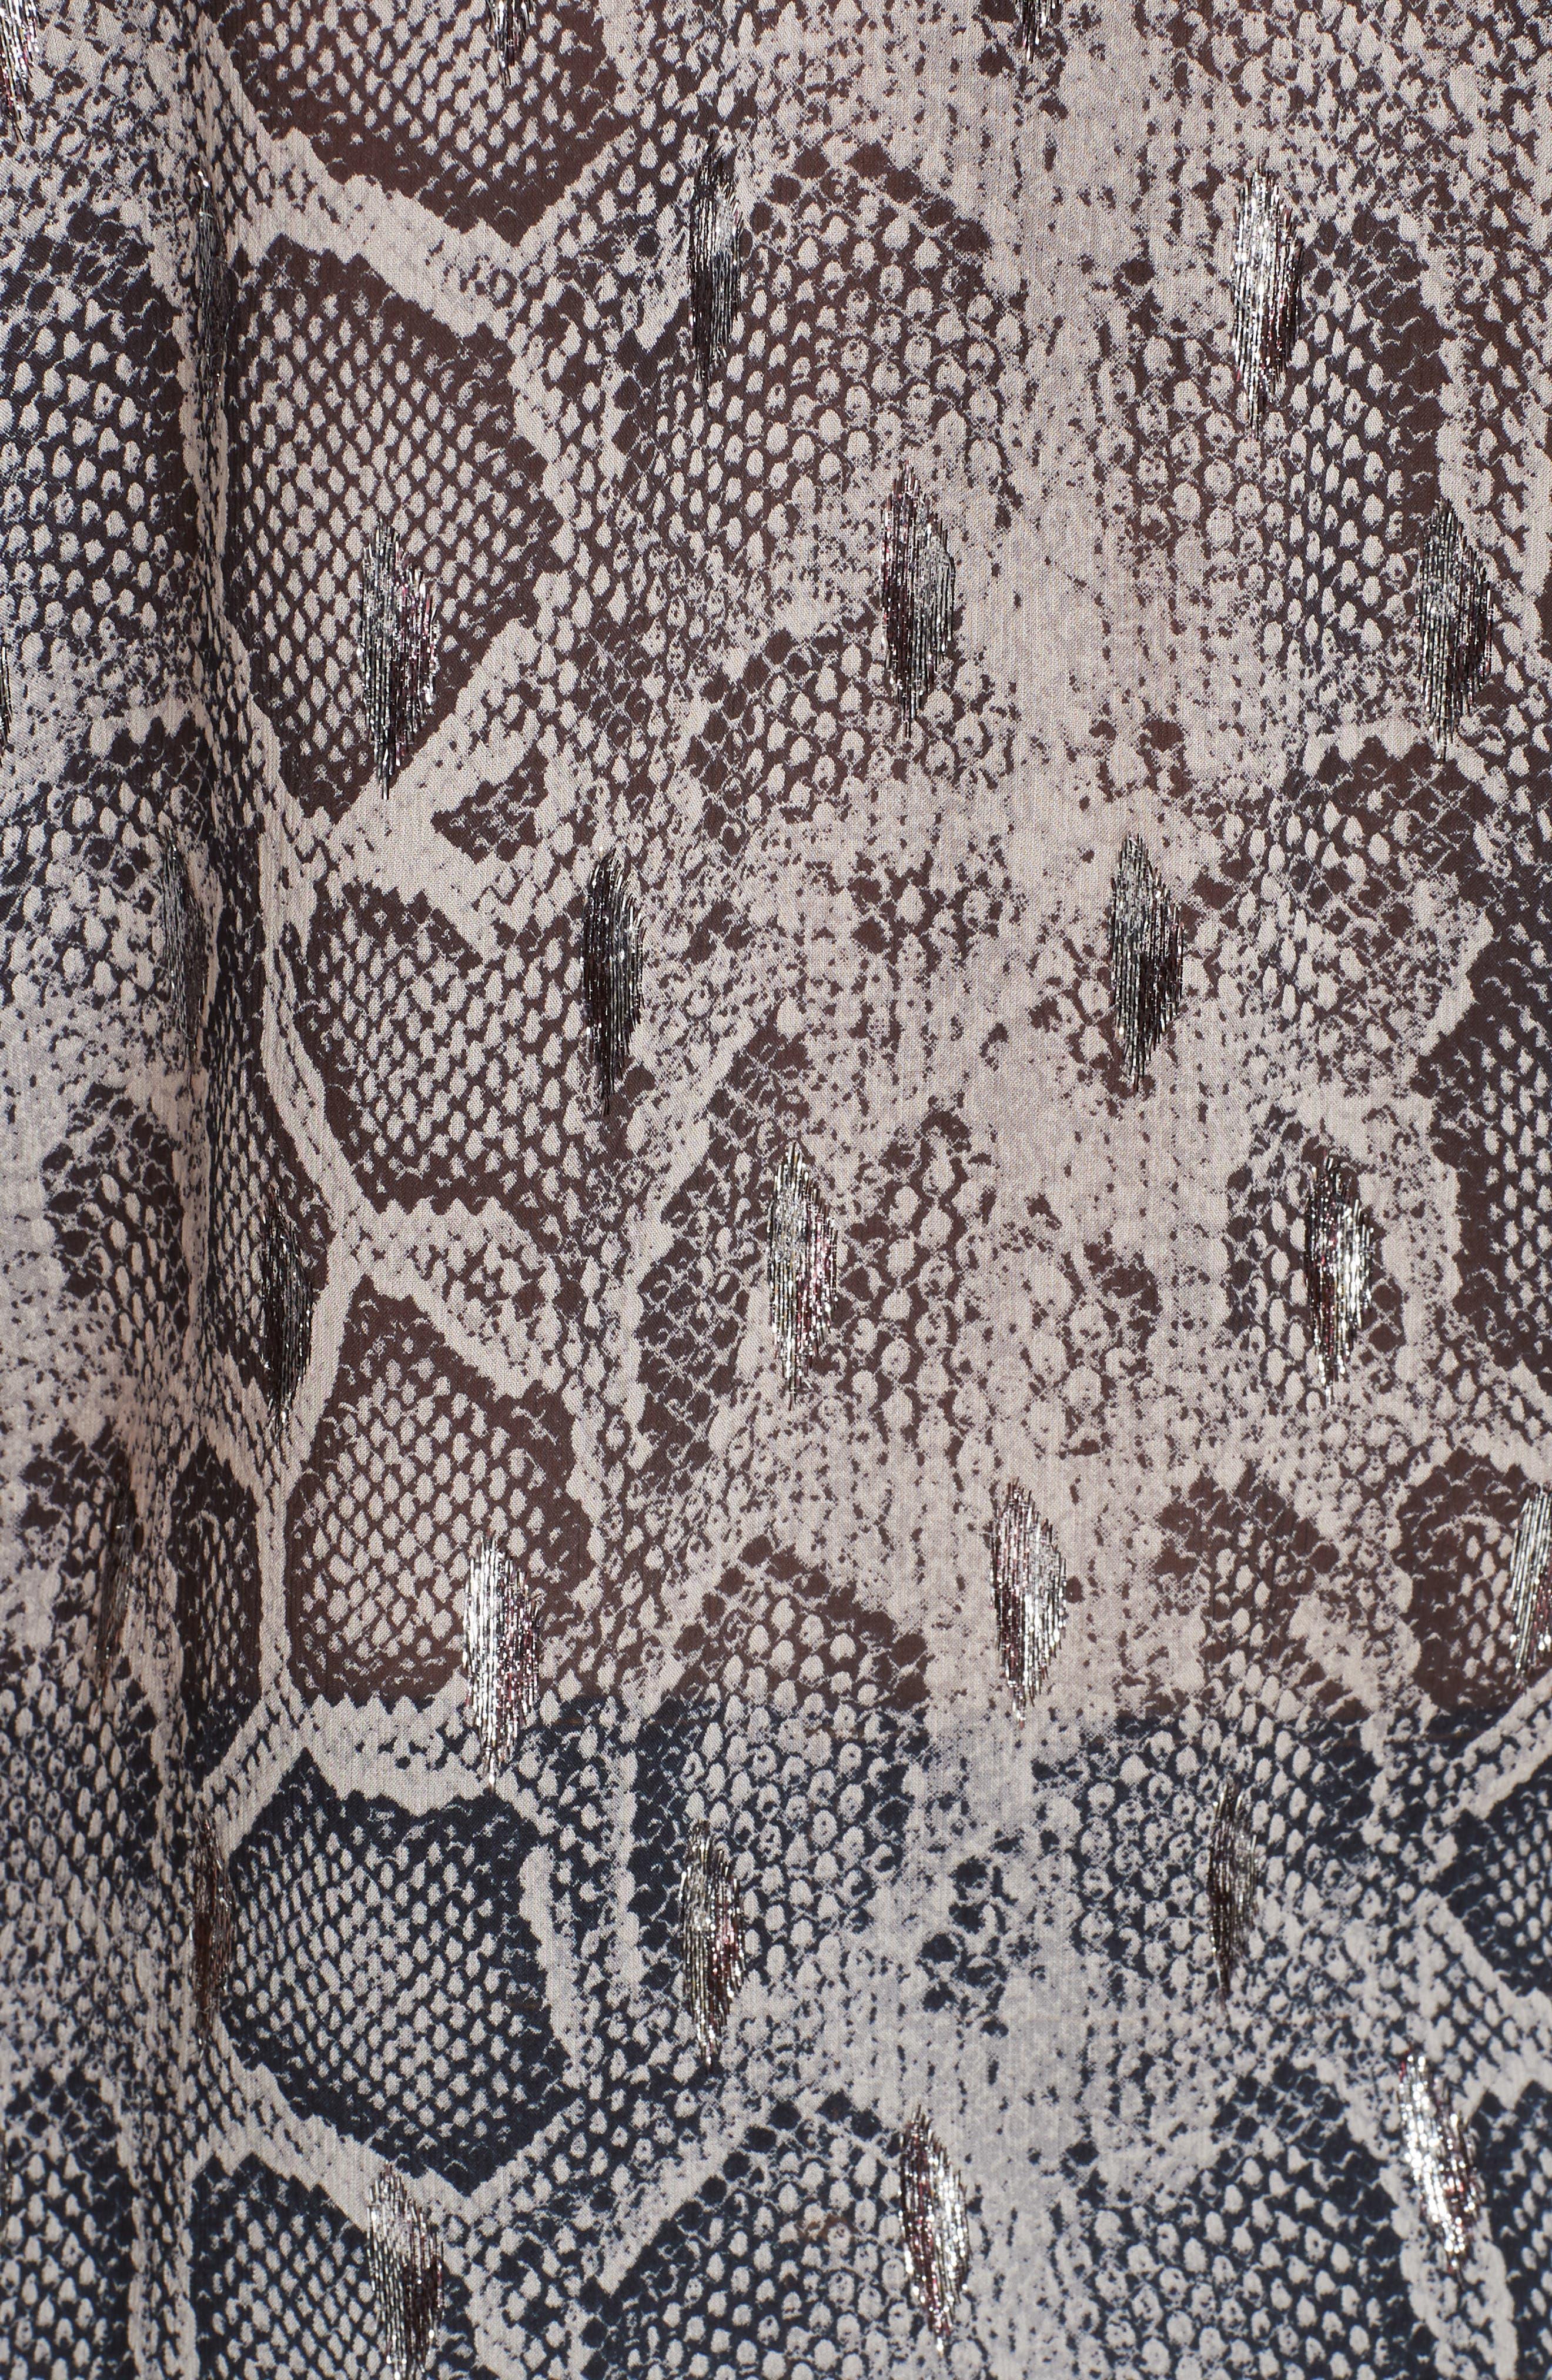 Ruffled Snakeskin Print Blouse,                             Alternate thumbnail 5, color,                             WASHED BLACK COMBO